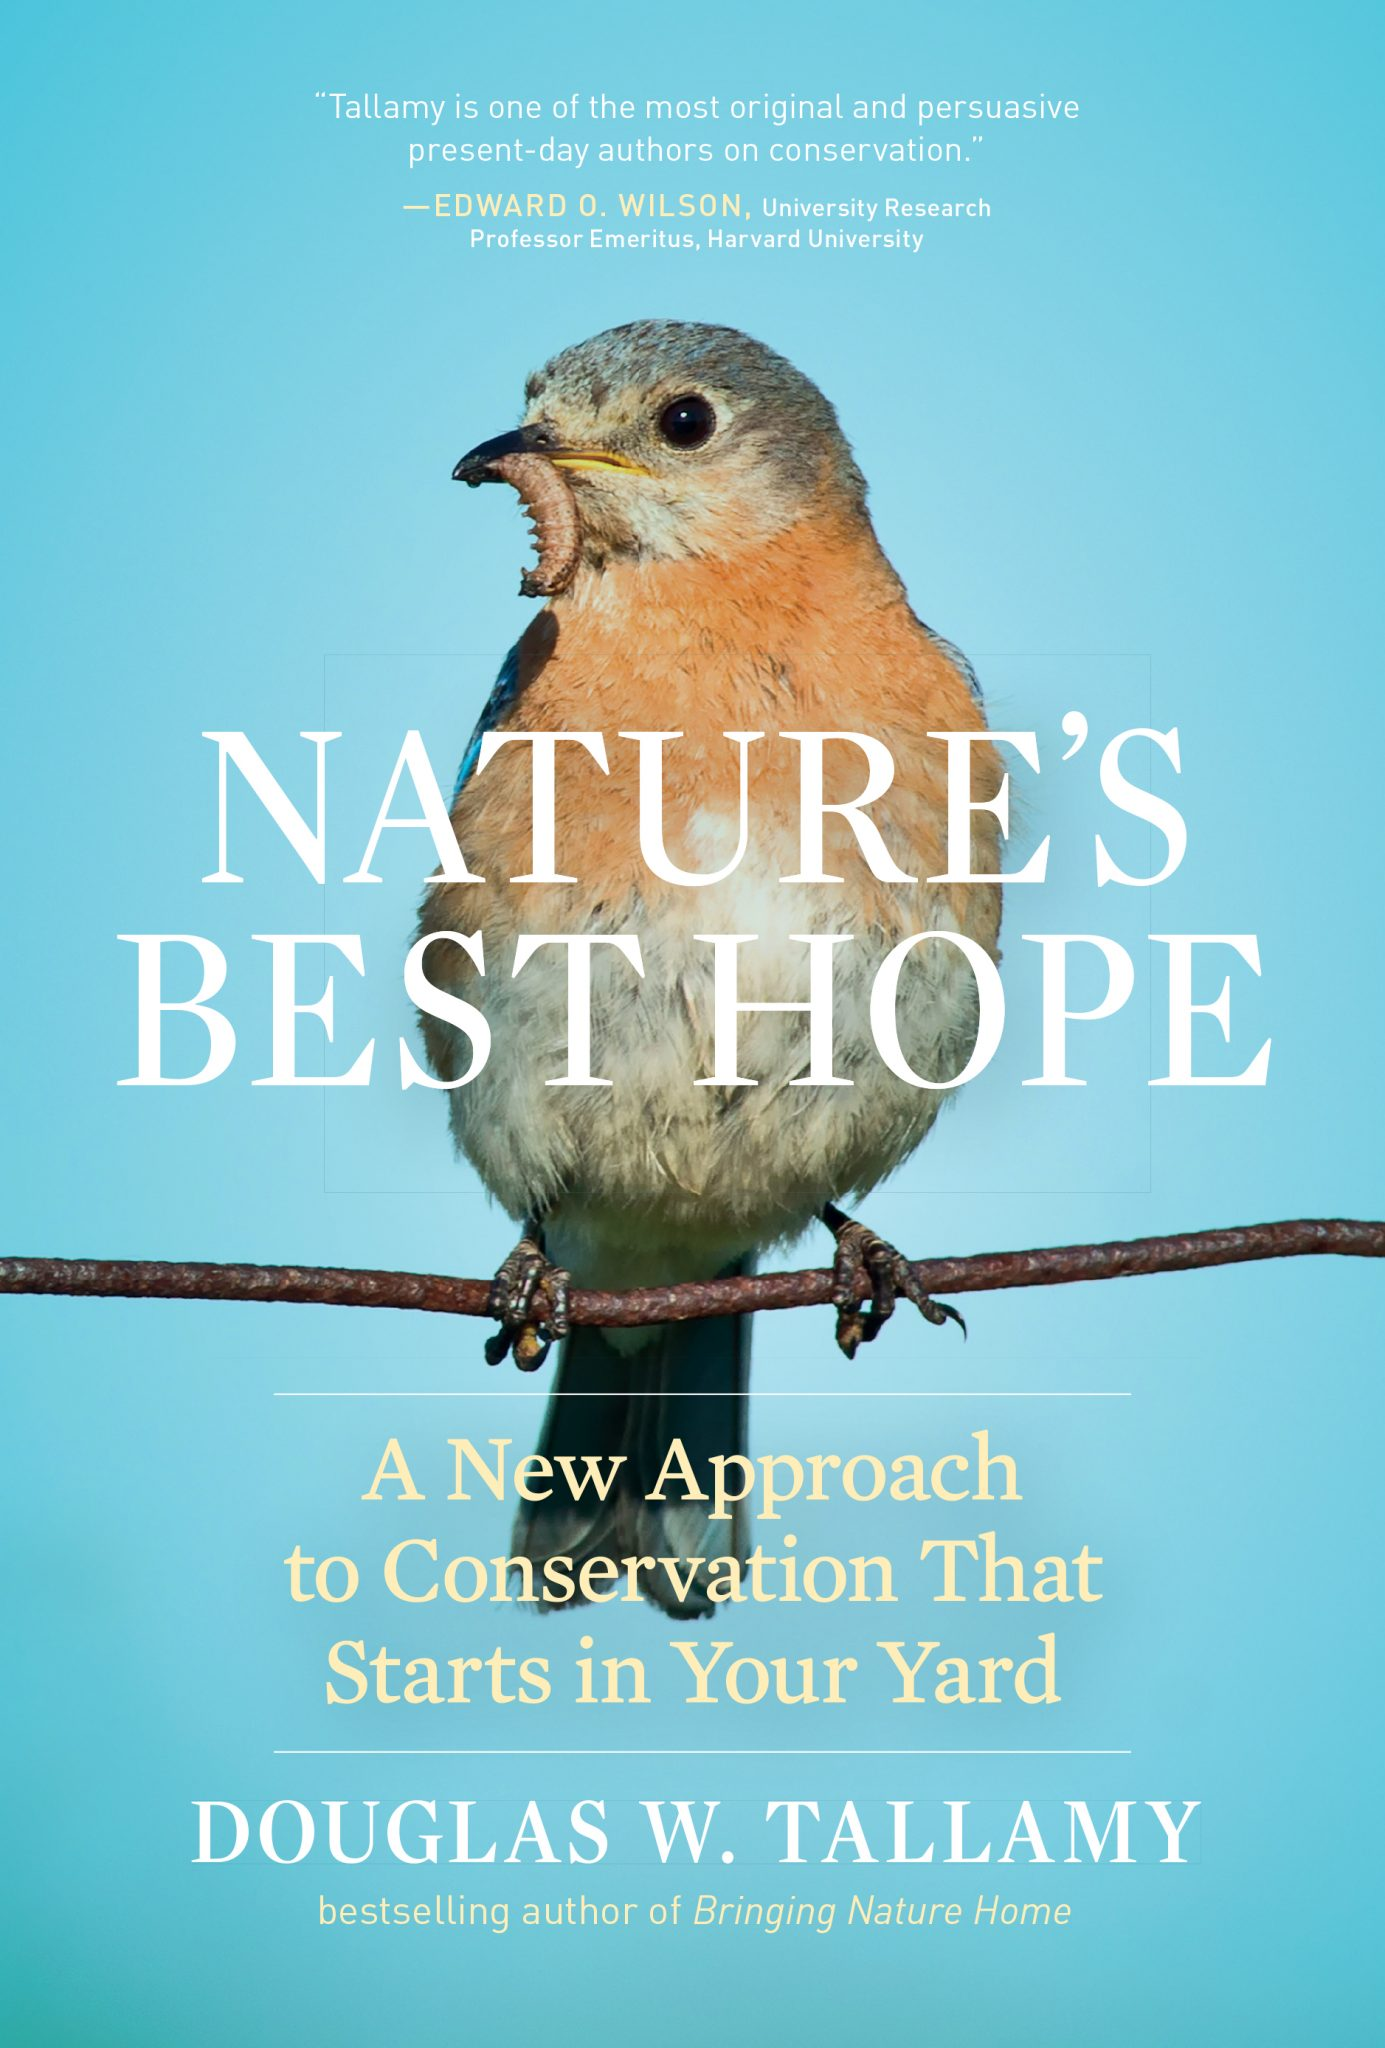 natures best hope cover 1385x2048 1 U7eO6X.tmp